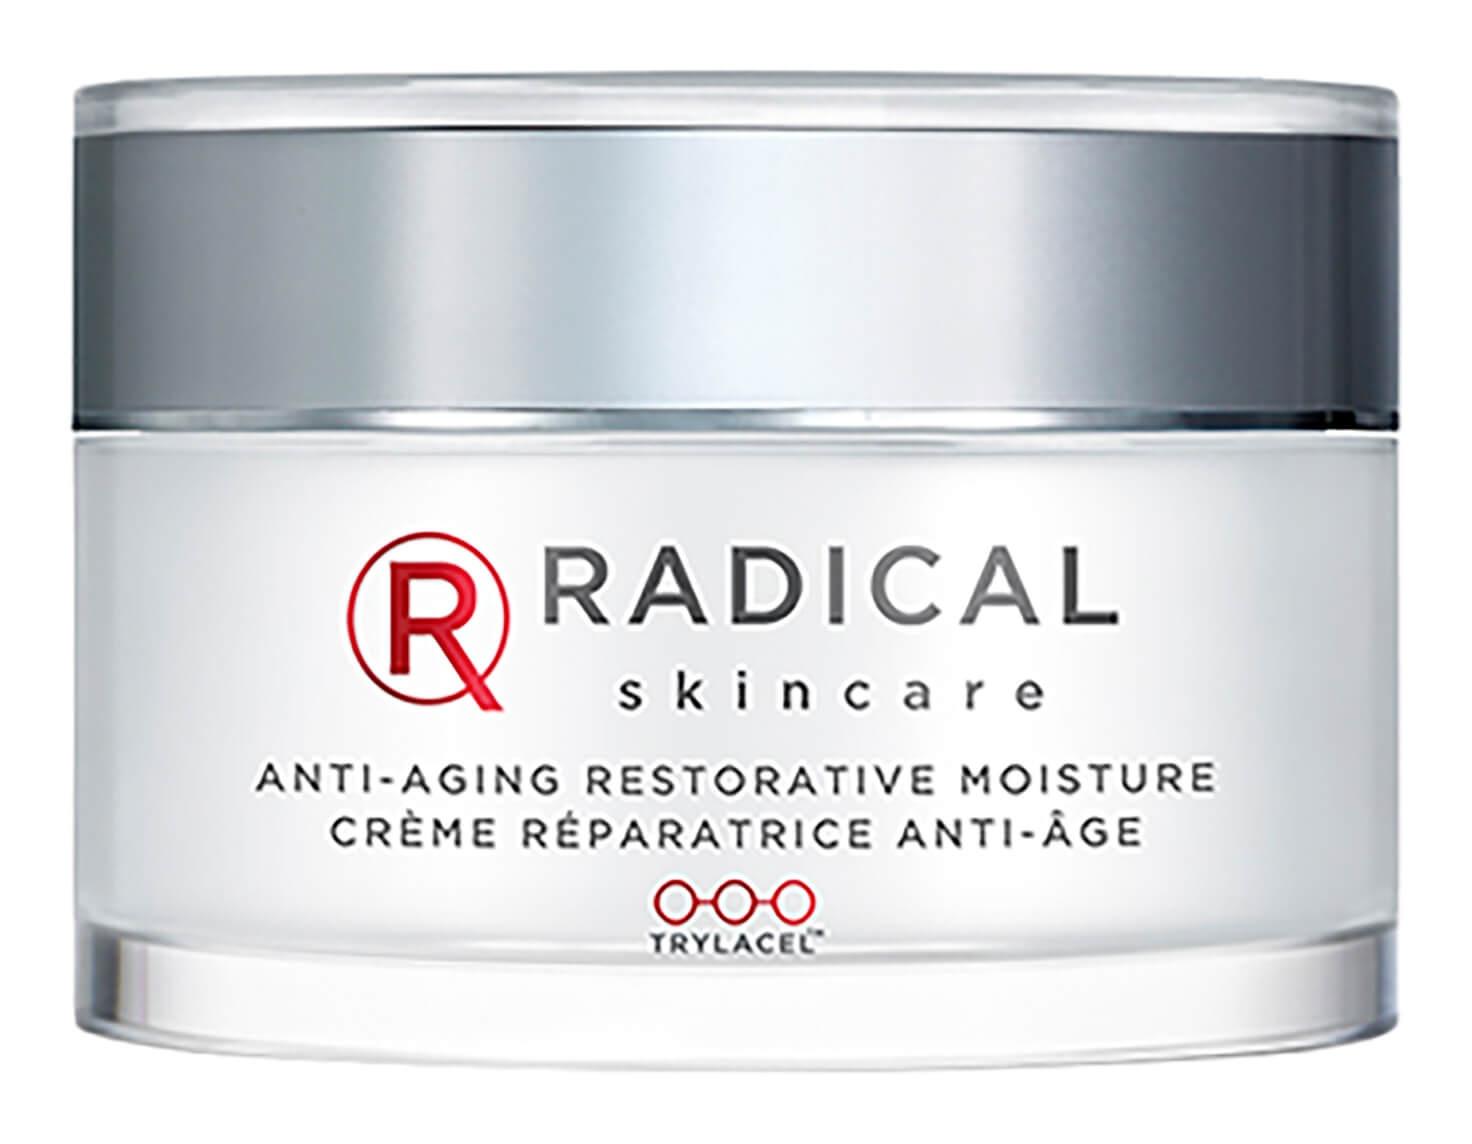 Radical Skincare Anti-Aging Restorative Moisture Crème